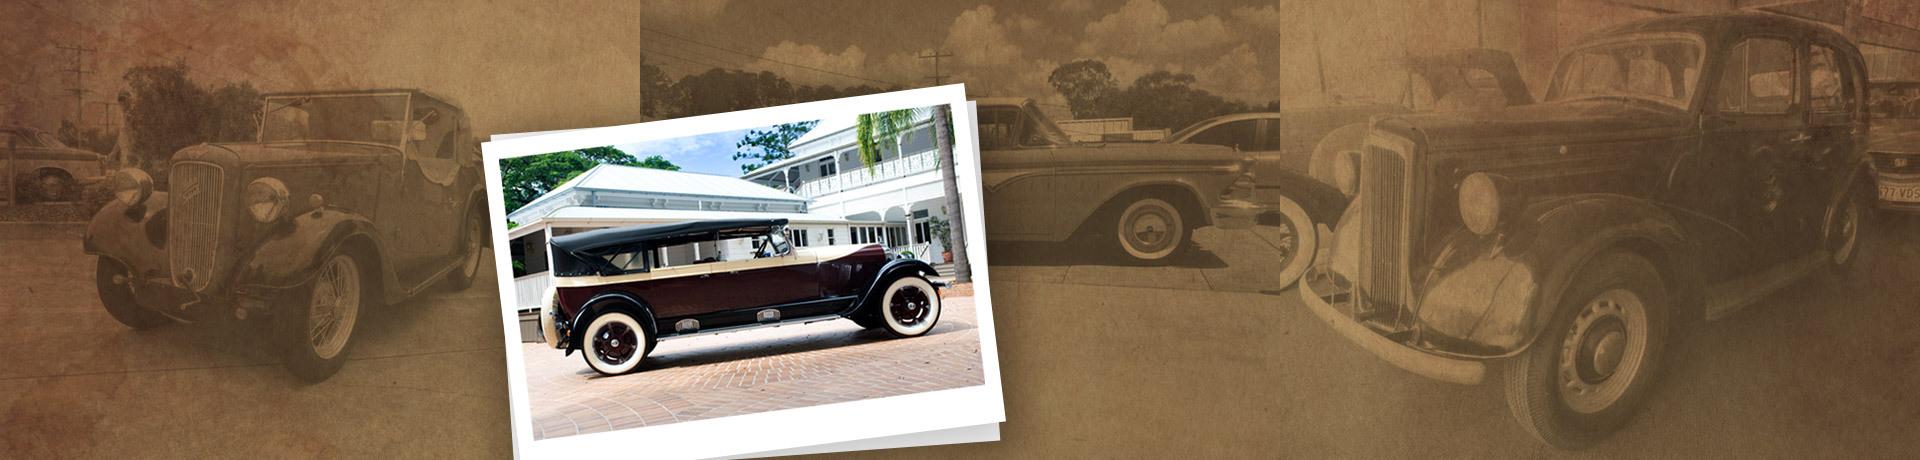 Undercover Cars | Used Cars Capalaba | Capalaba